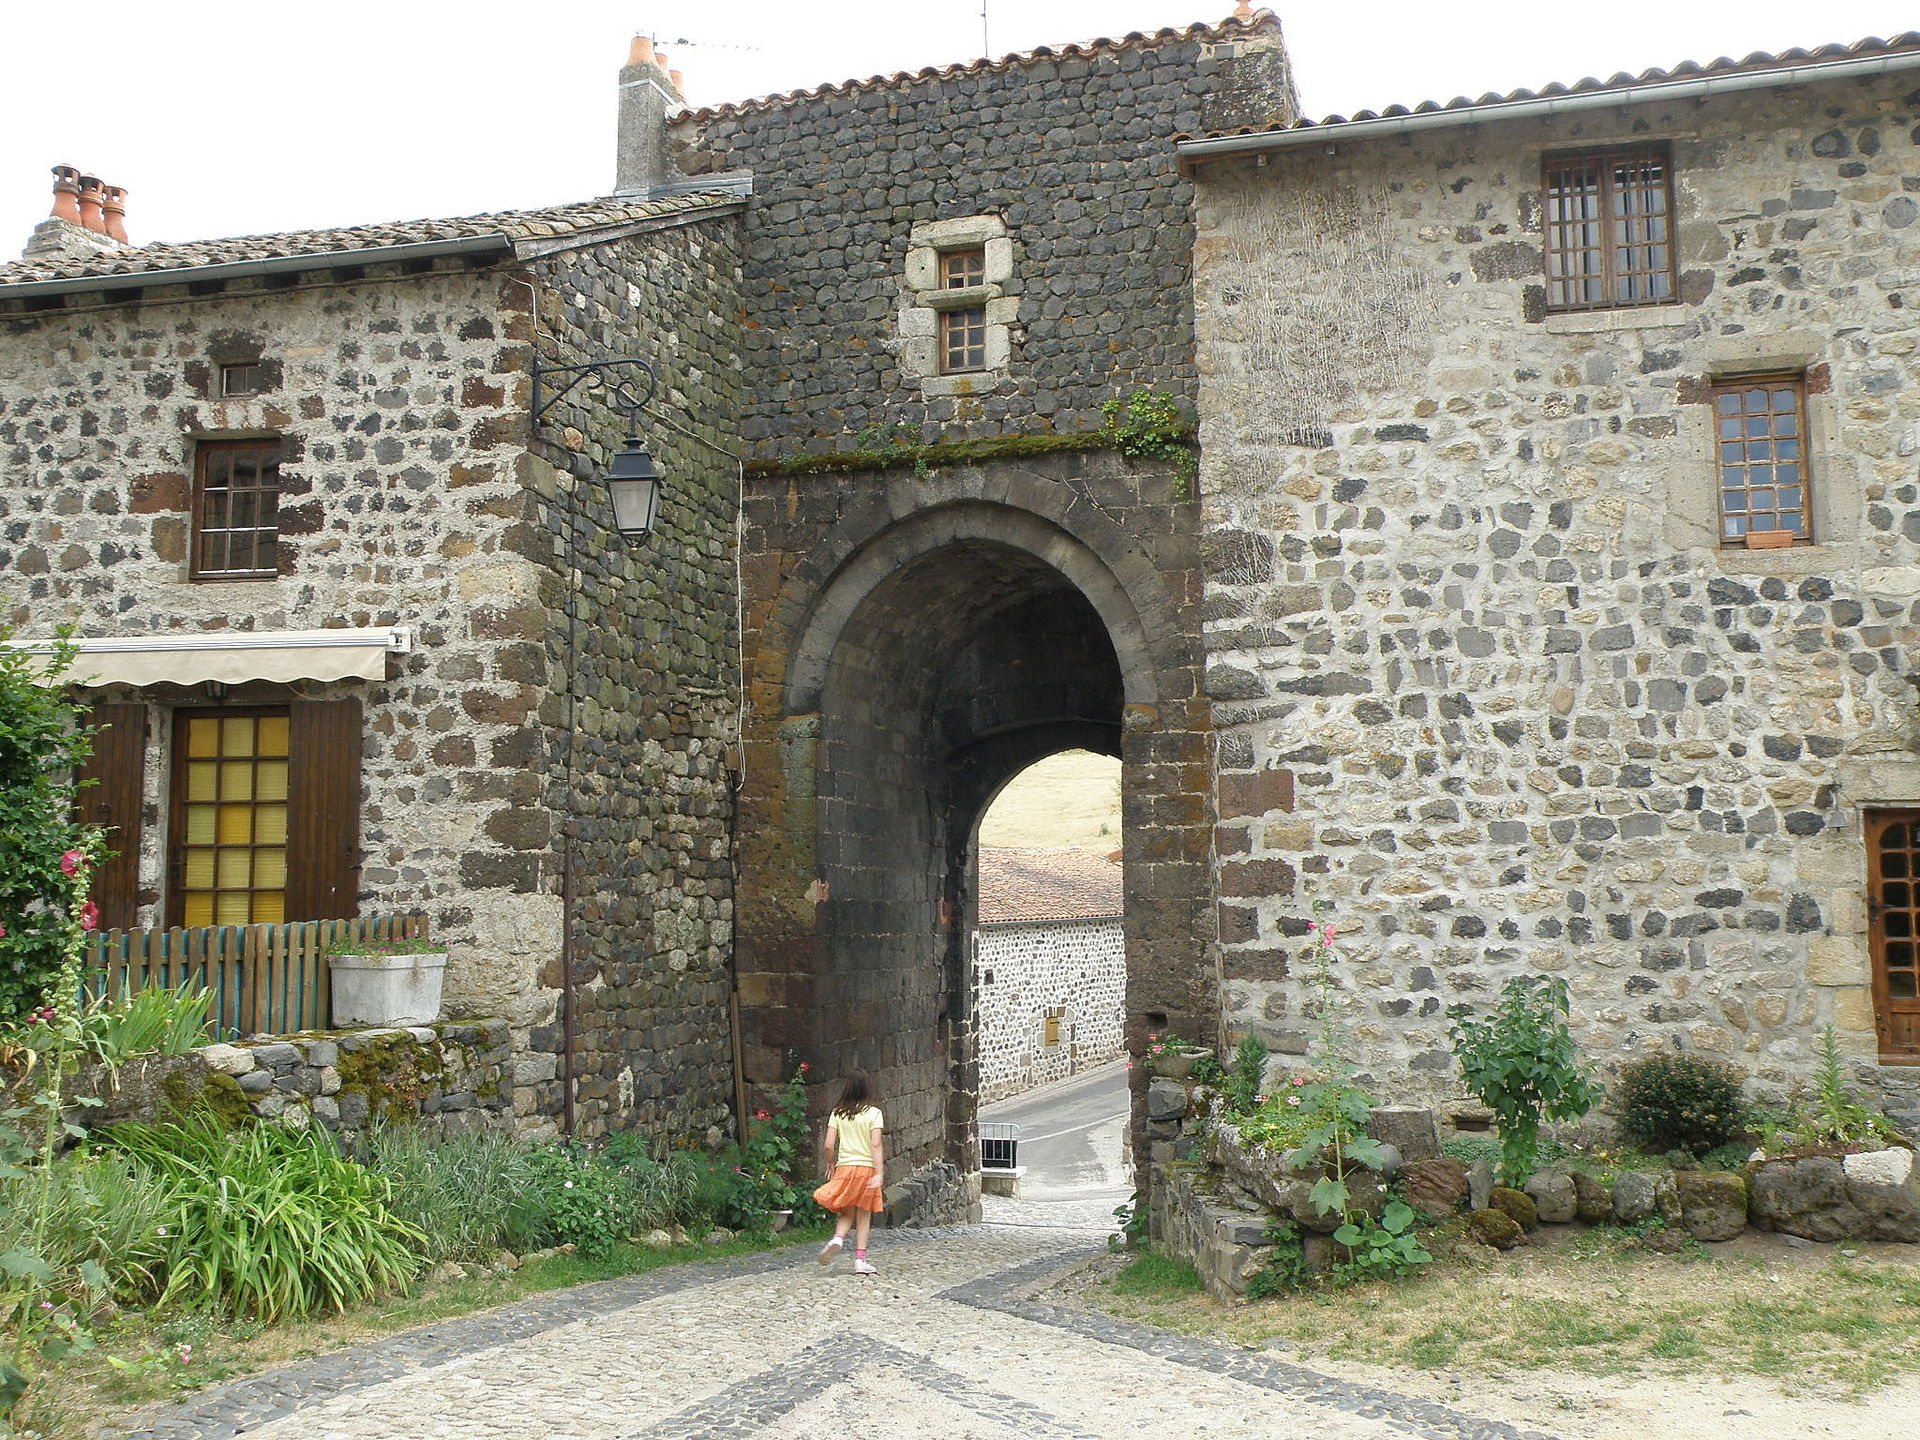 Arlempdes - La Poterne (face nord)